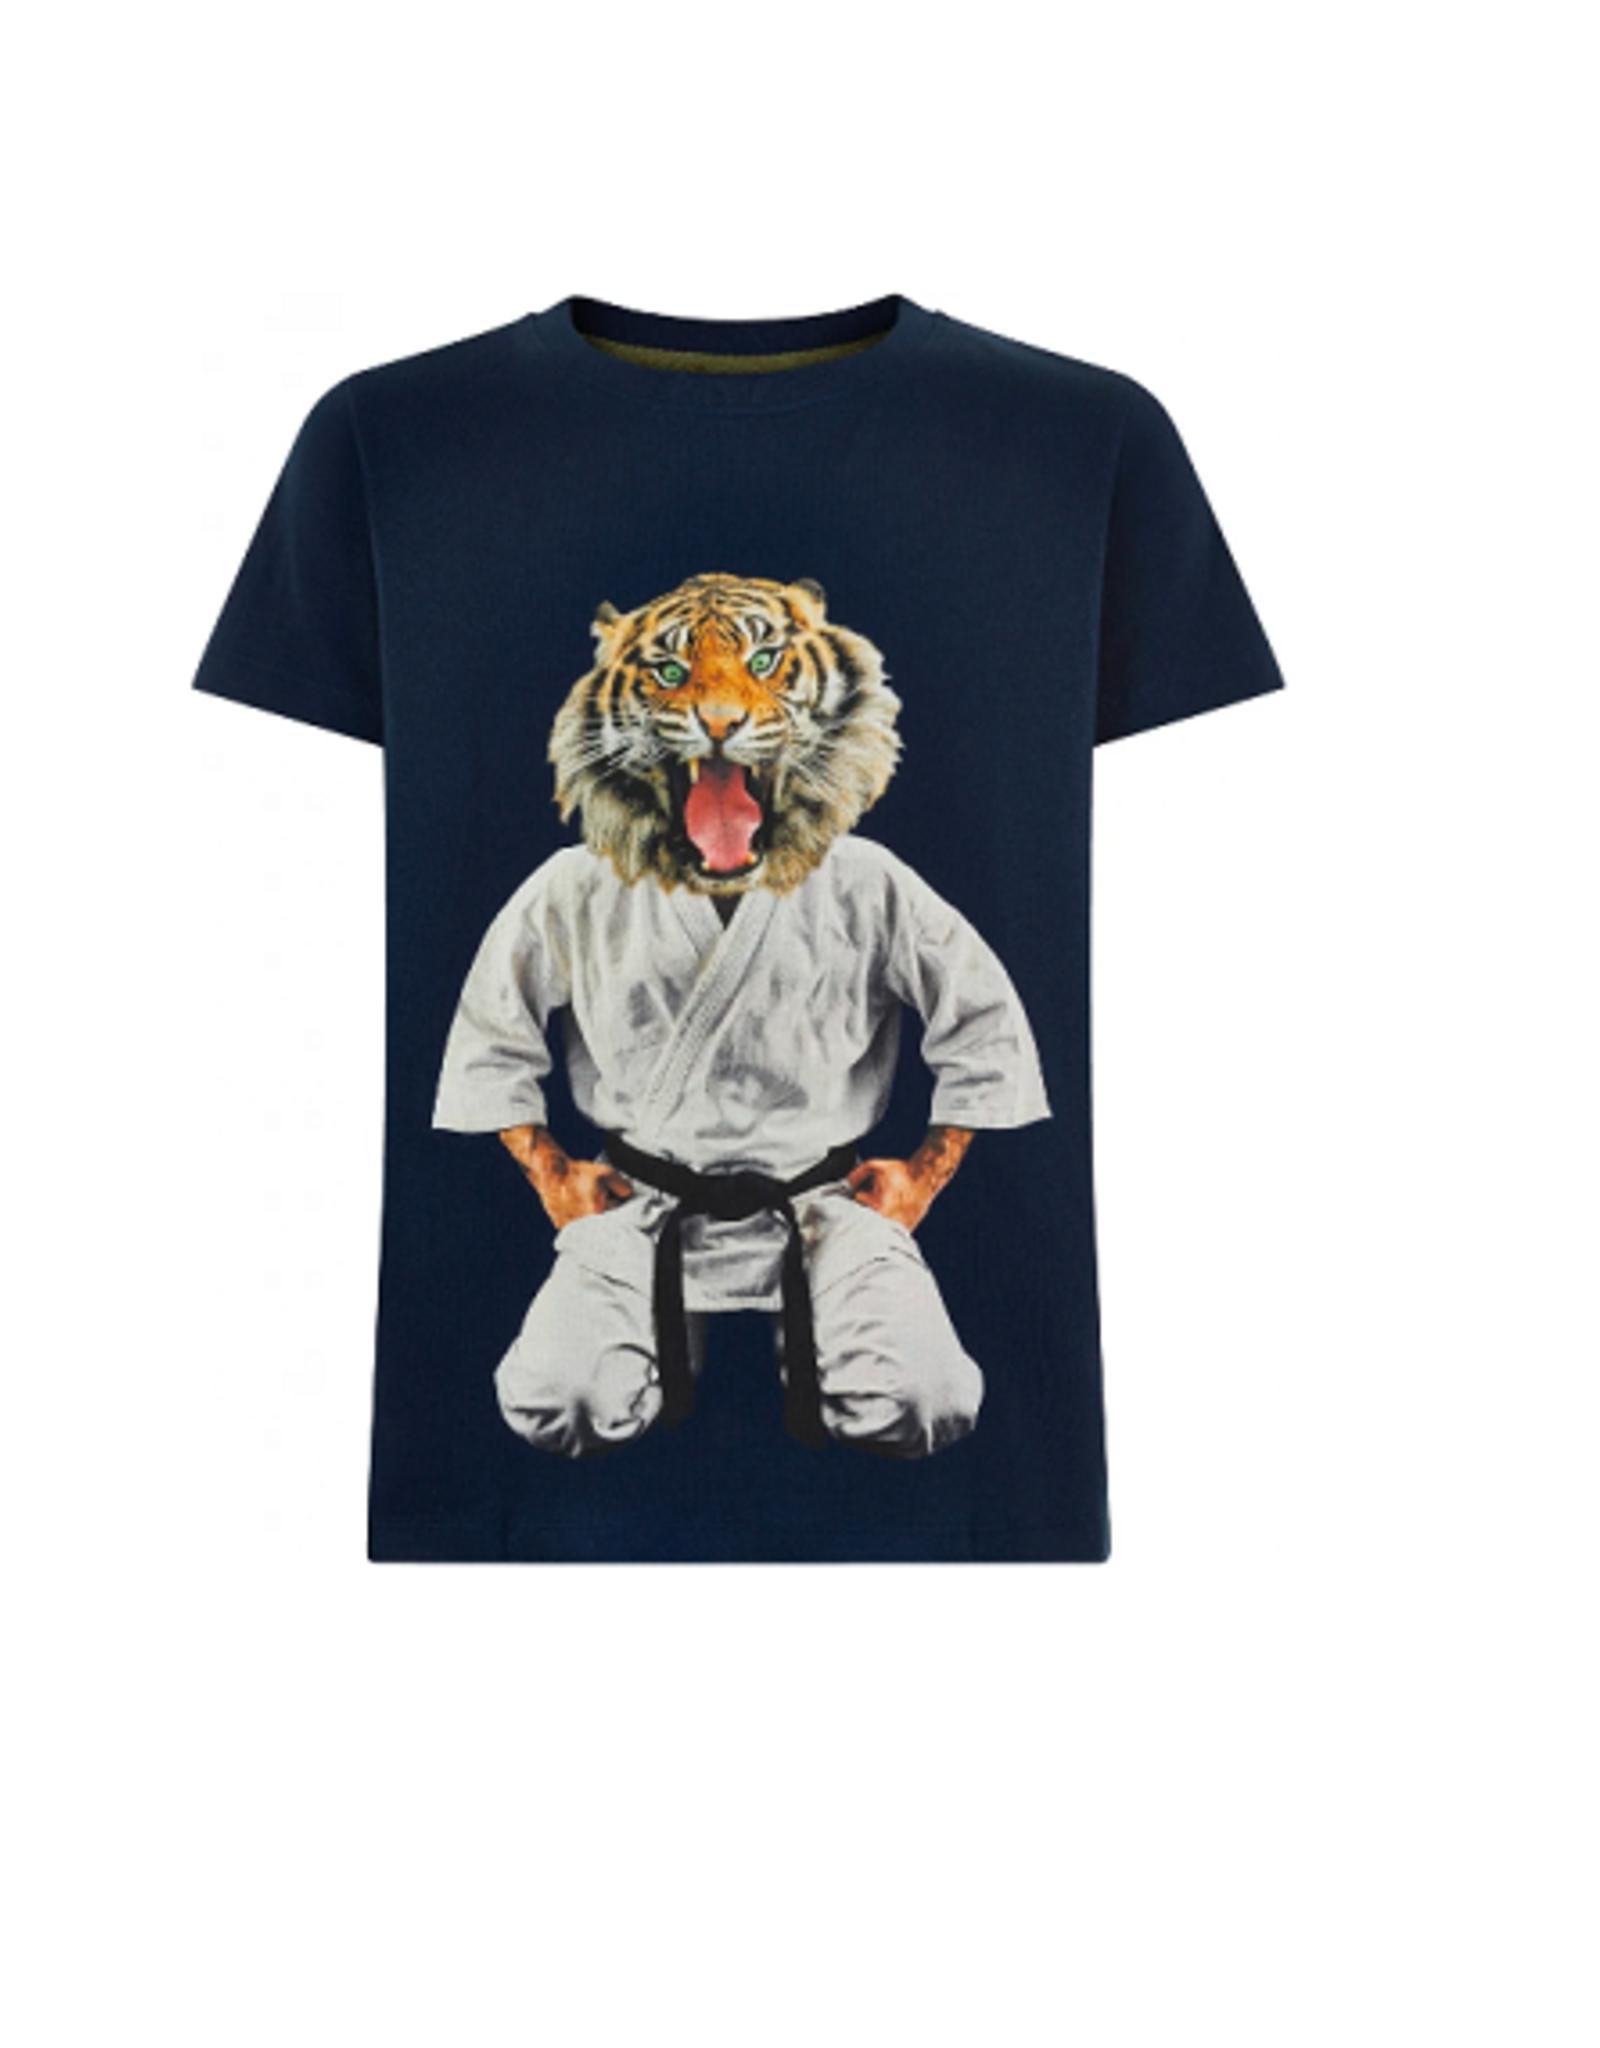 The New T-shirt navy judotijger